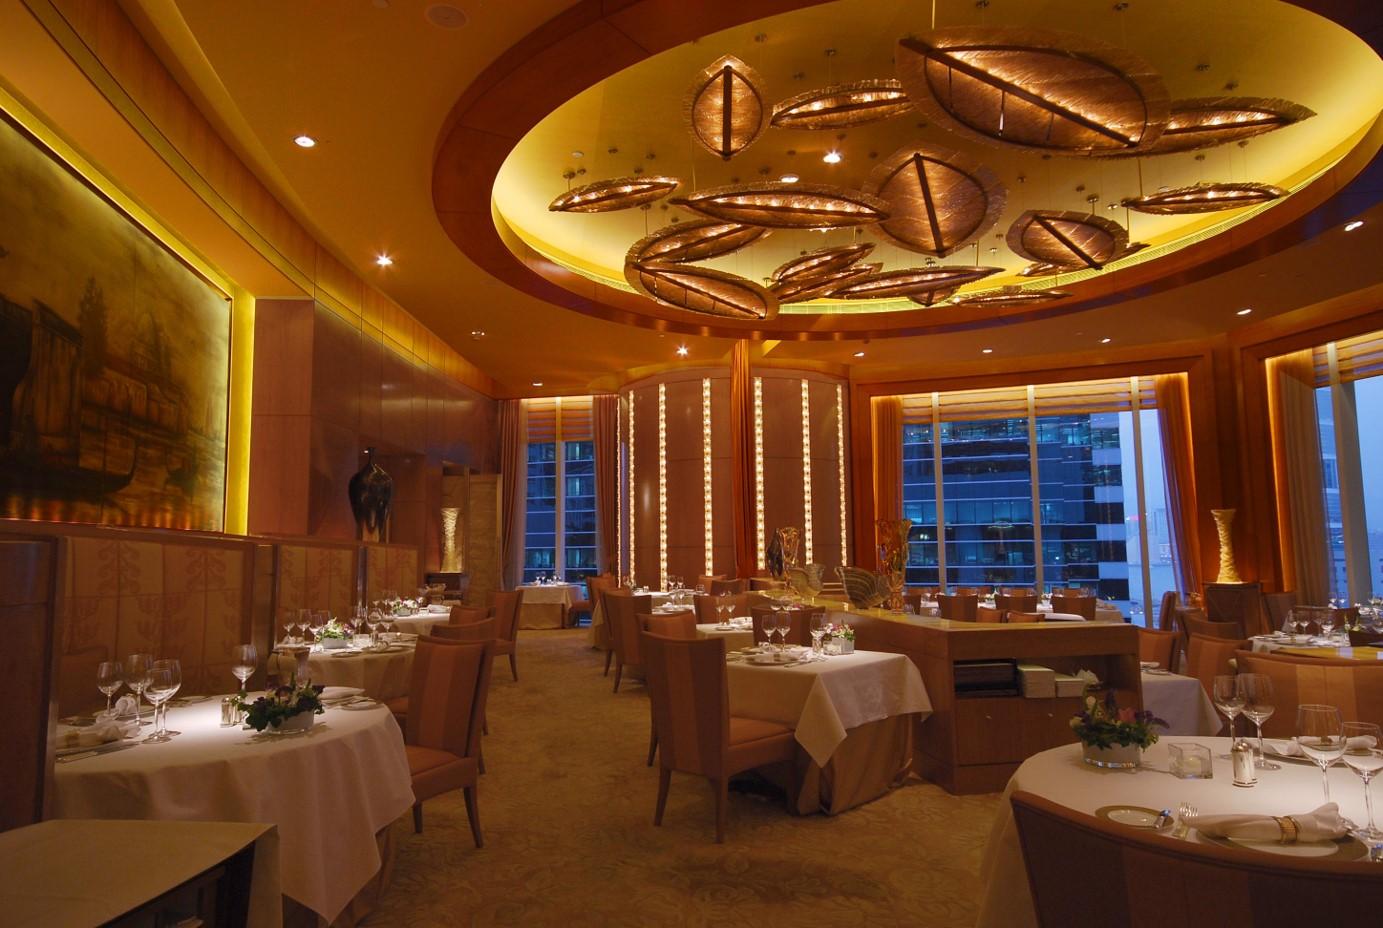 Nicholini's_Italian_Restaurant_,Conrad_Hotel,_Hong_Kong_1